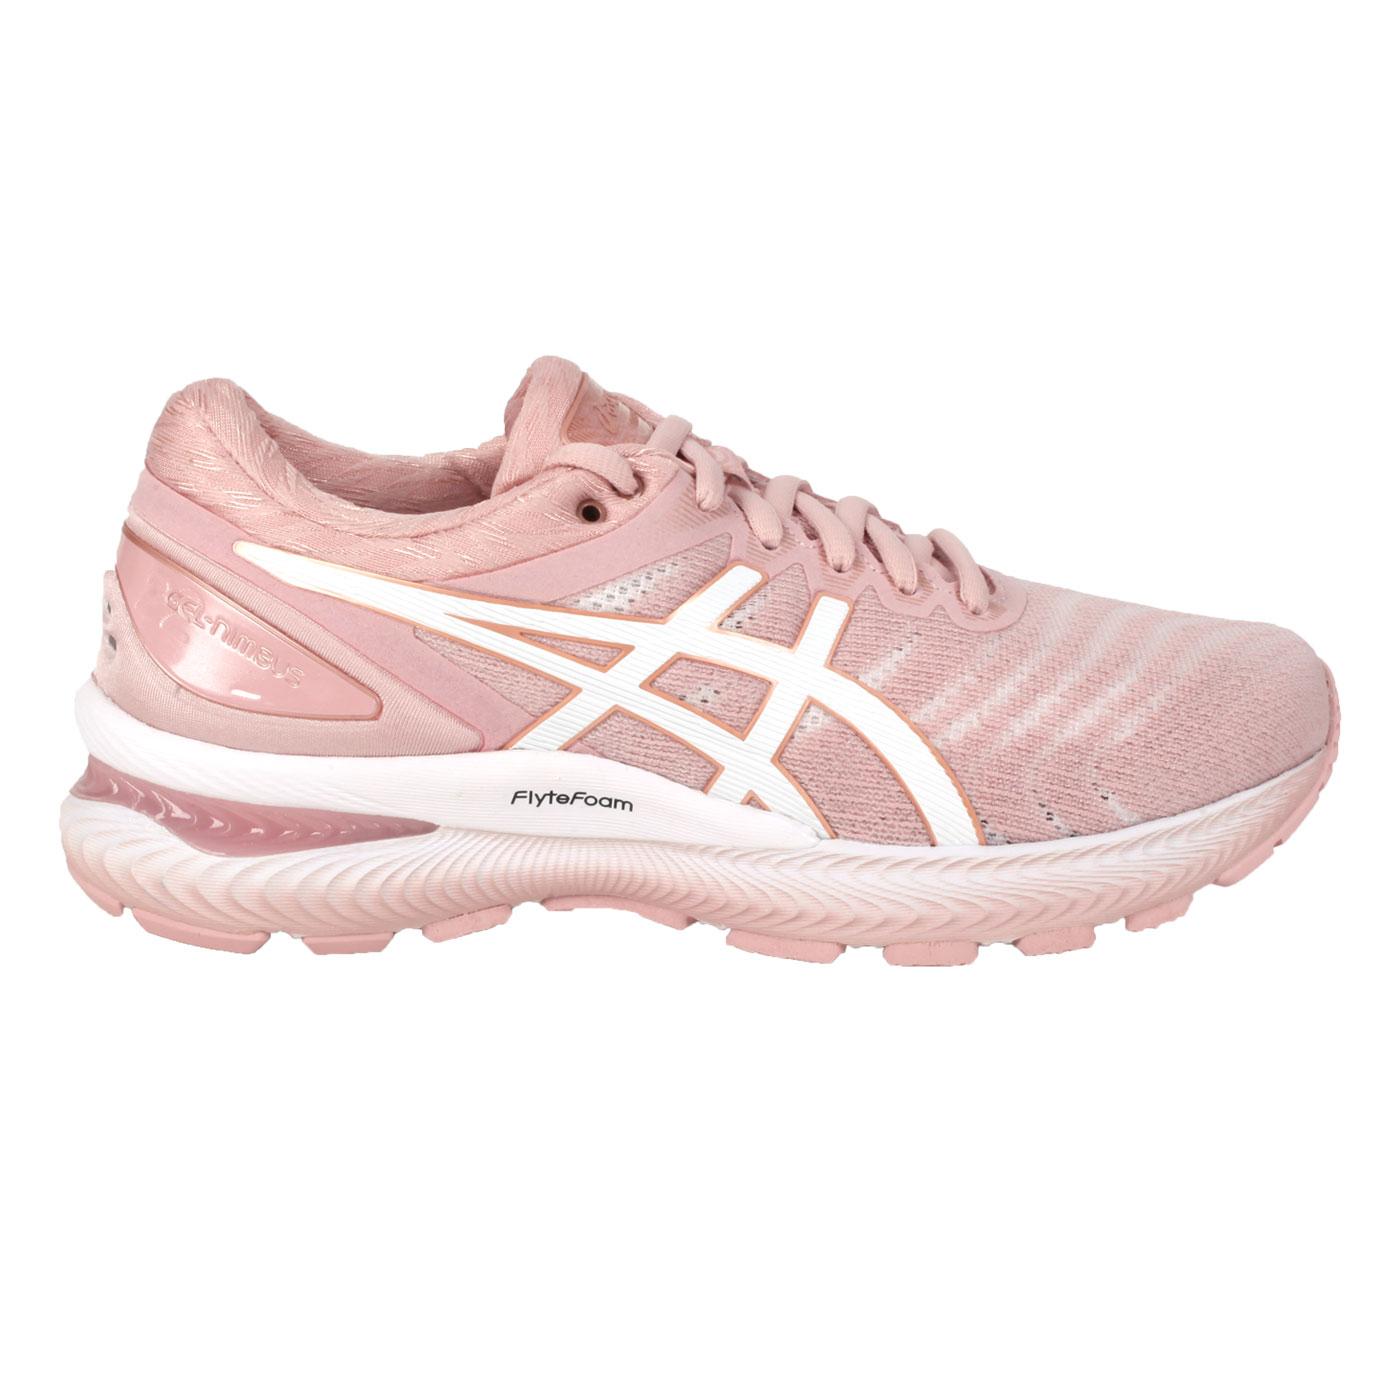 ASICS 女款慢跑鞋-WIDE  @GEL-NIMBUS 22@1012A586-703 - 珊瑚粉白